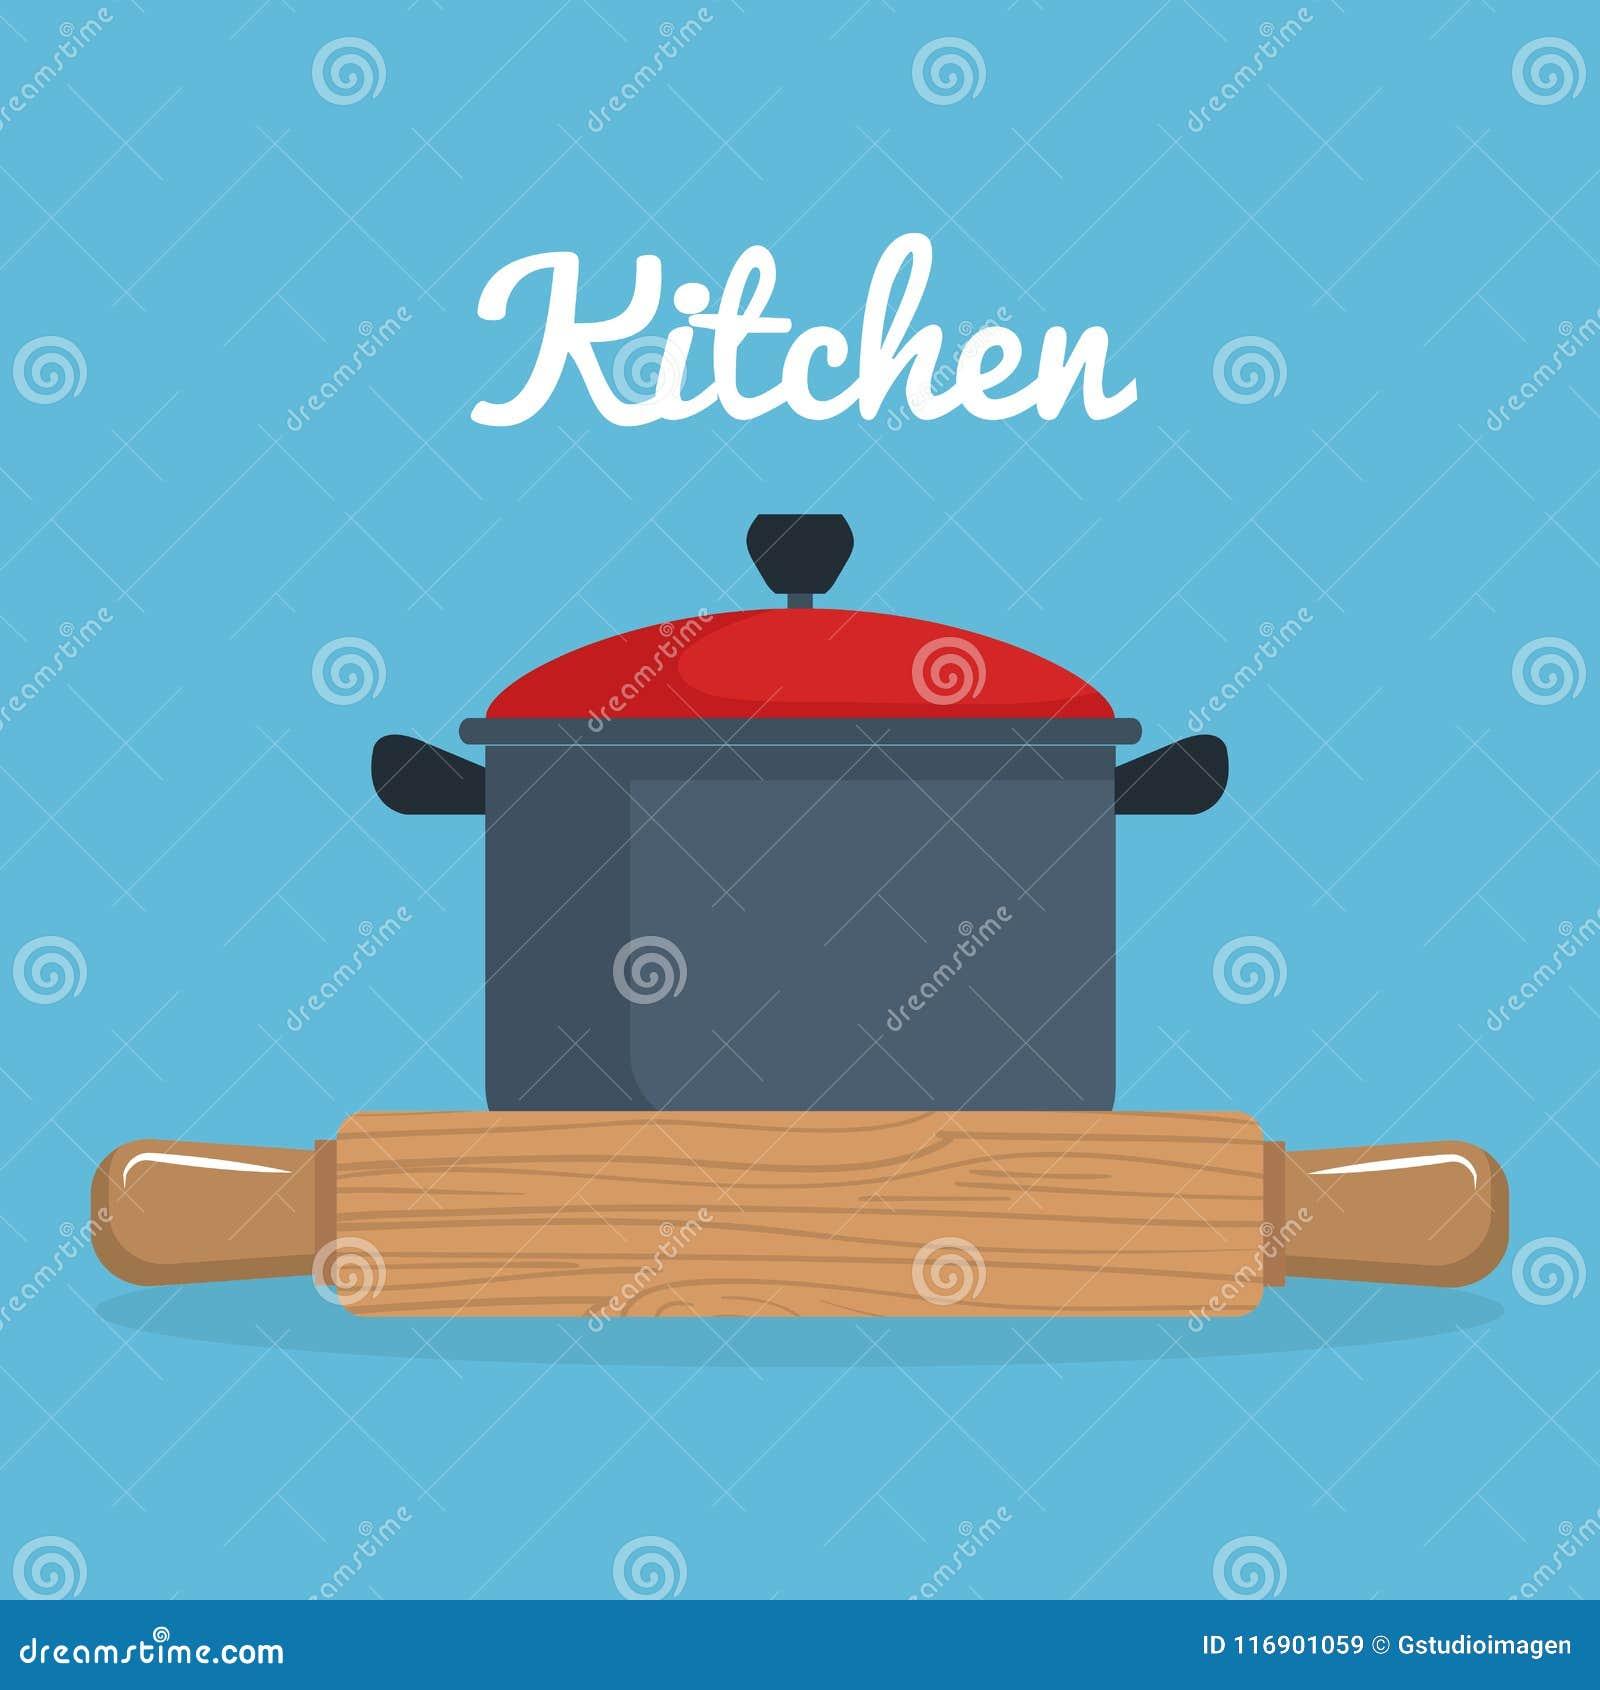 Kitchen Wooden Roll And Pot Utensil Icon Stock Illustration ...